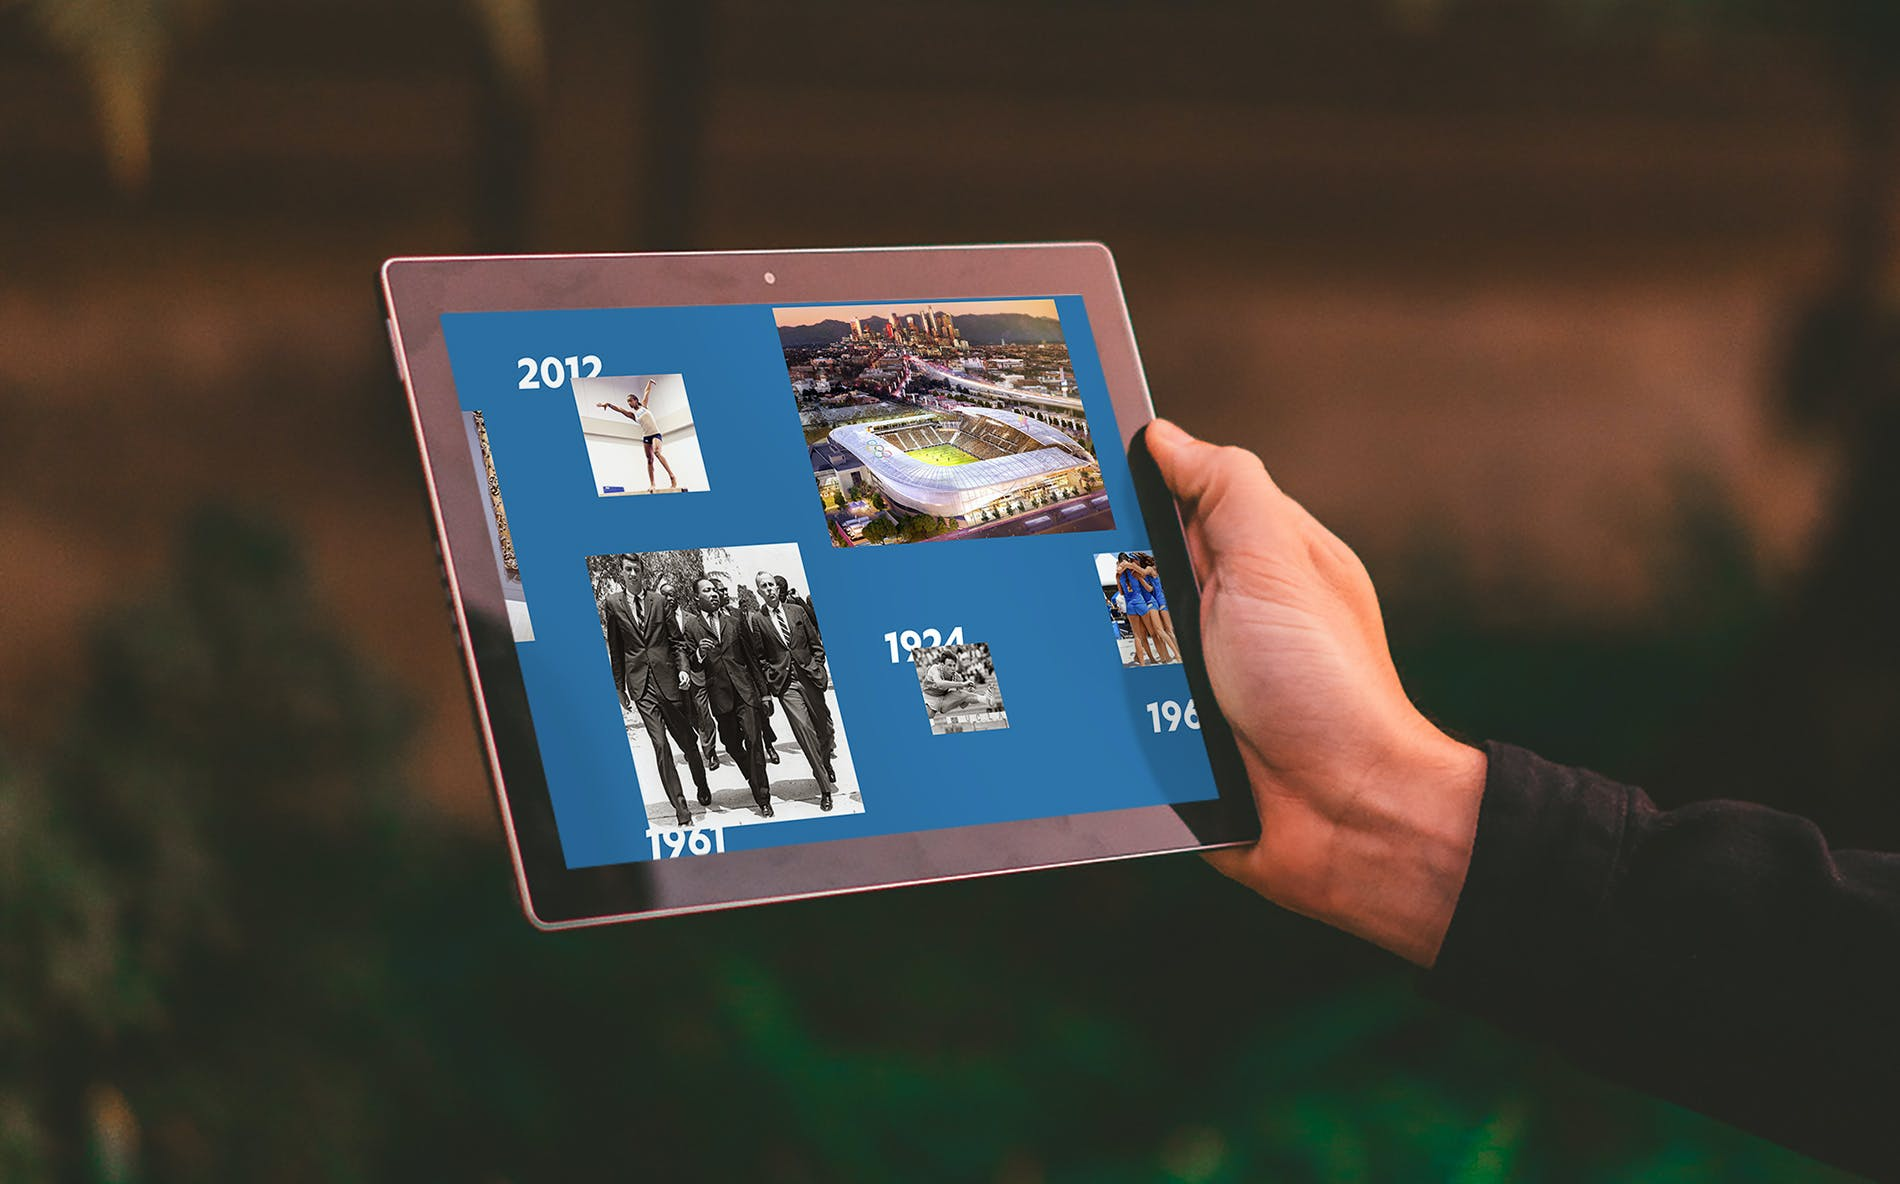 UCLA 100 website in iPad